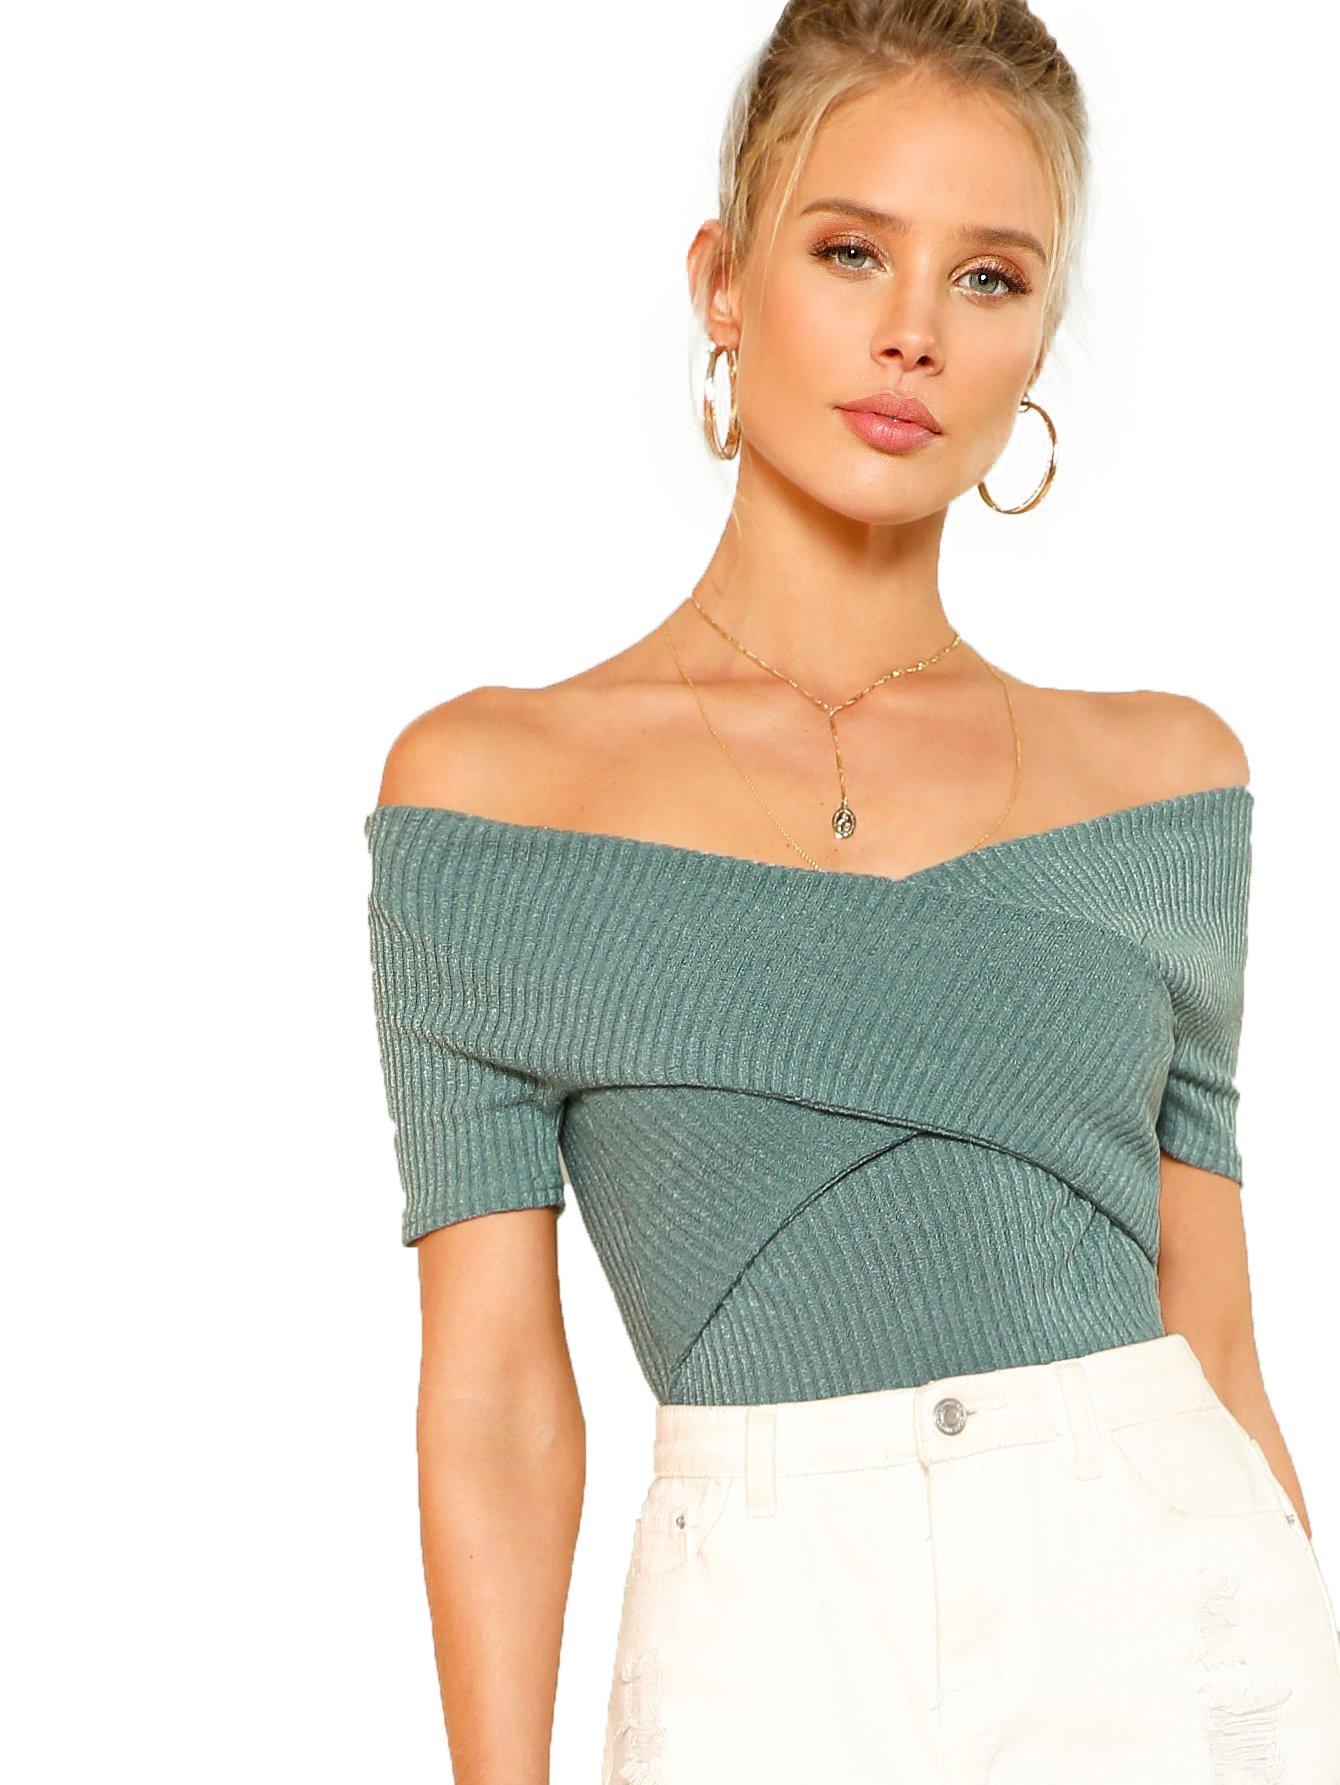 Romwe Women's Off Shoulder Cross Wrap Slim Fit Short Sleeve Blouse Tops Green Large